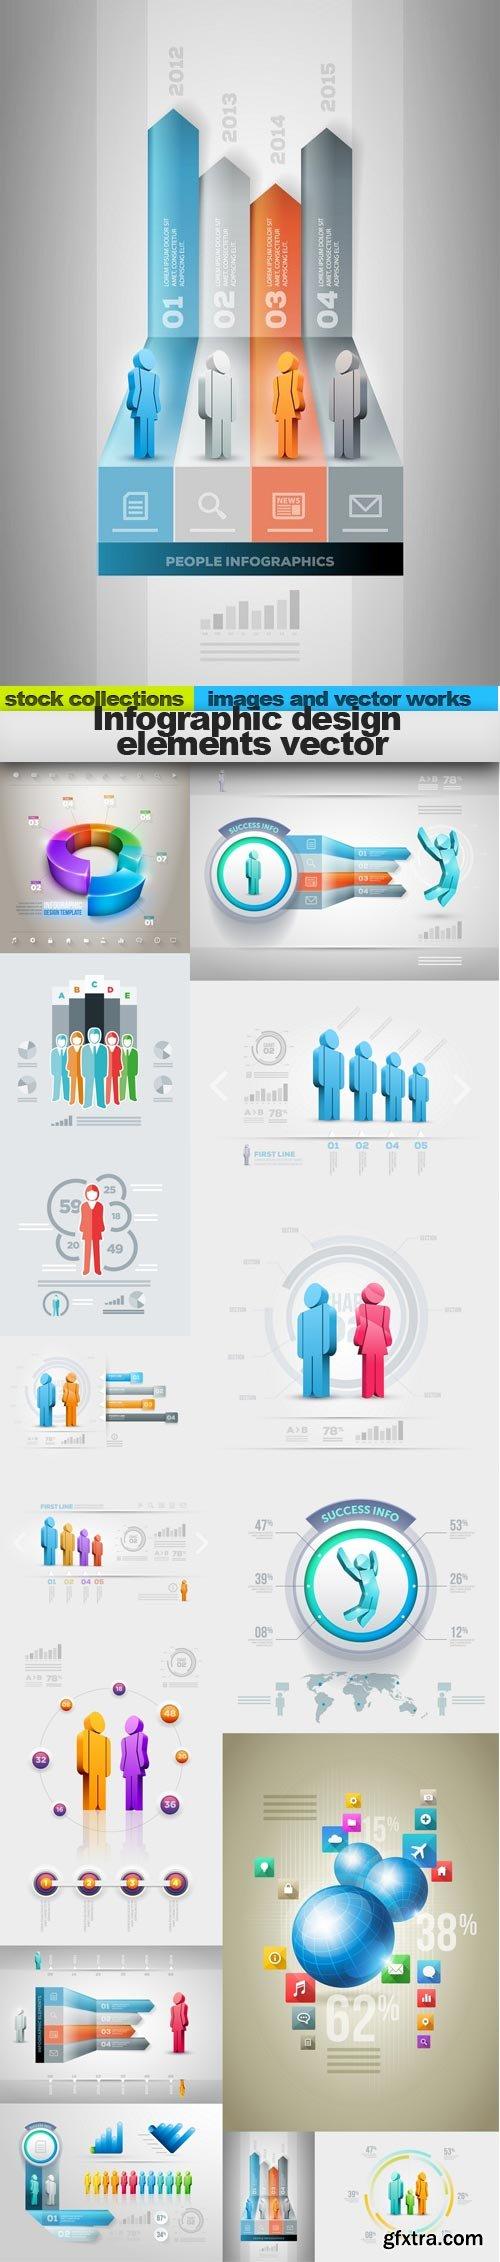 Infographic design elements vector, 15 x EPS